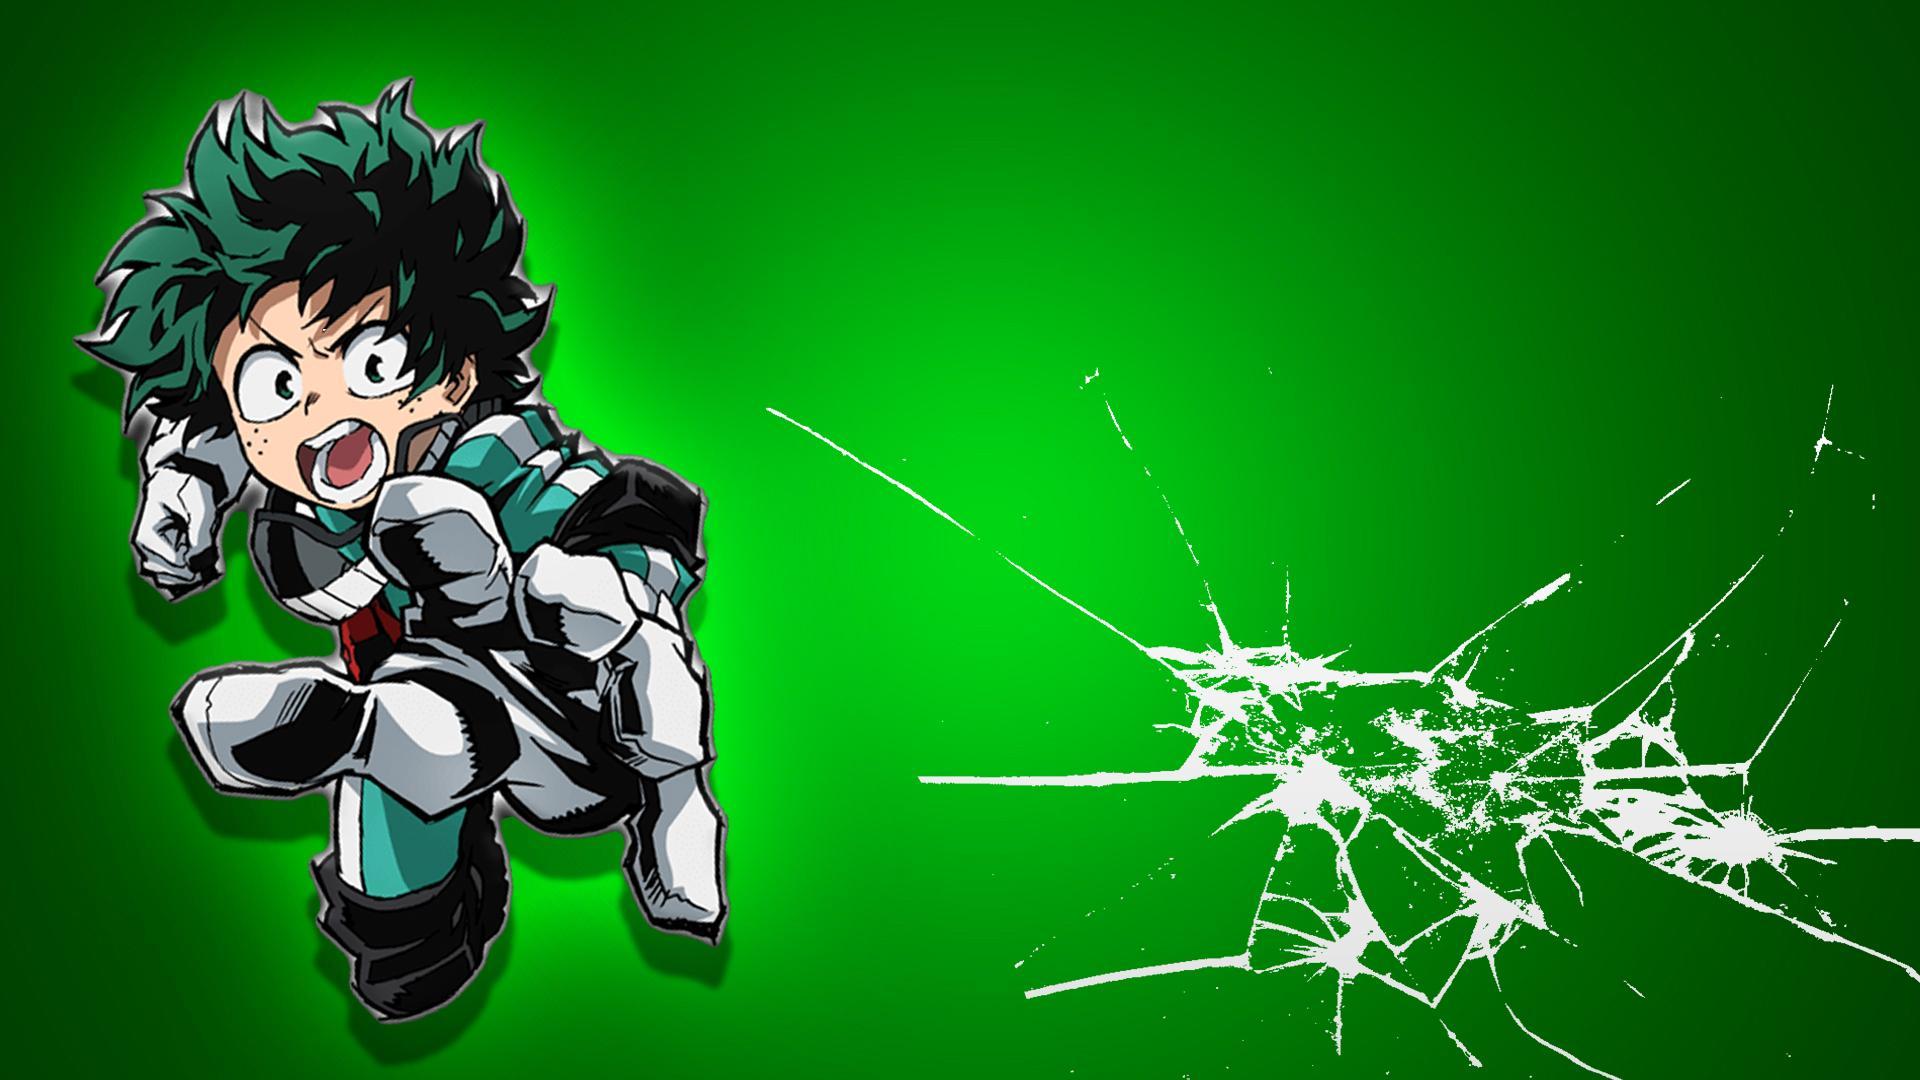 My Hero Academia Deku Wallpapers Top Free My Hero Academia Deku